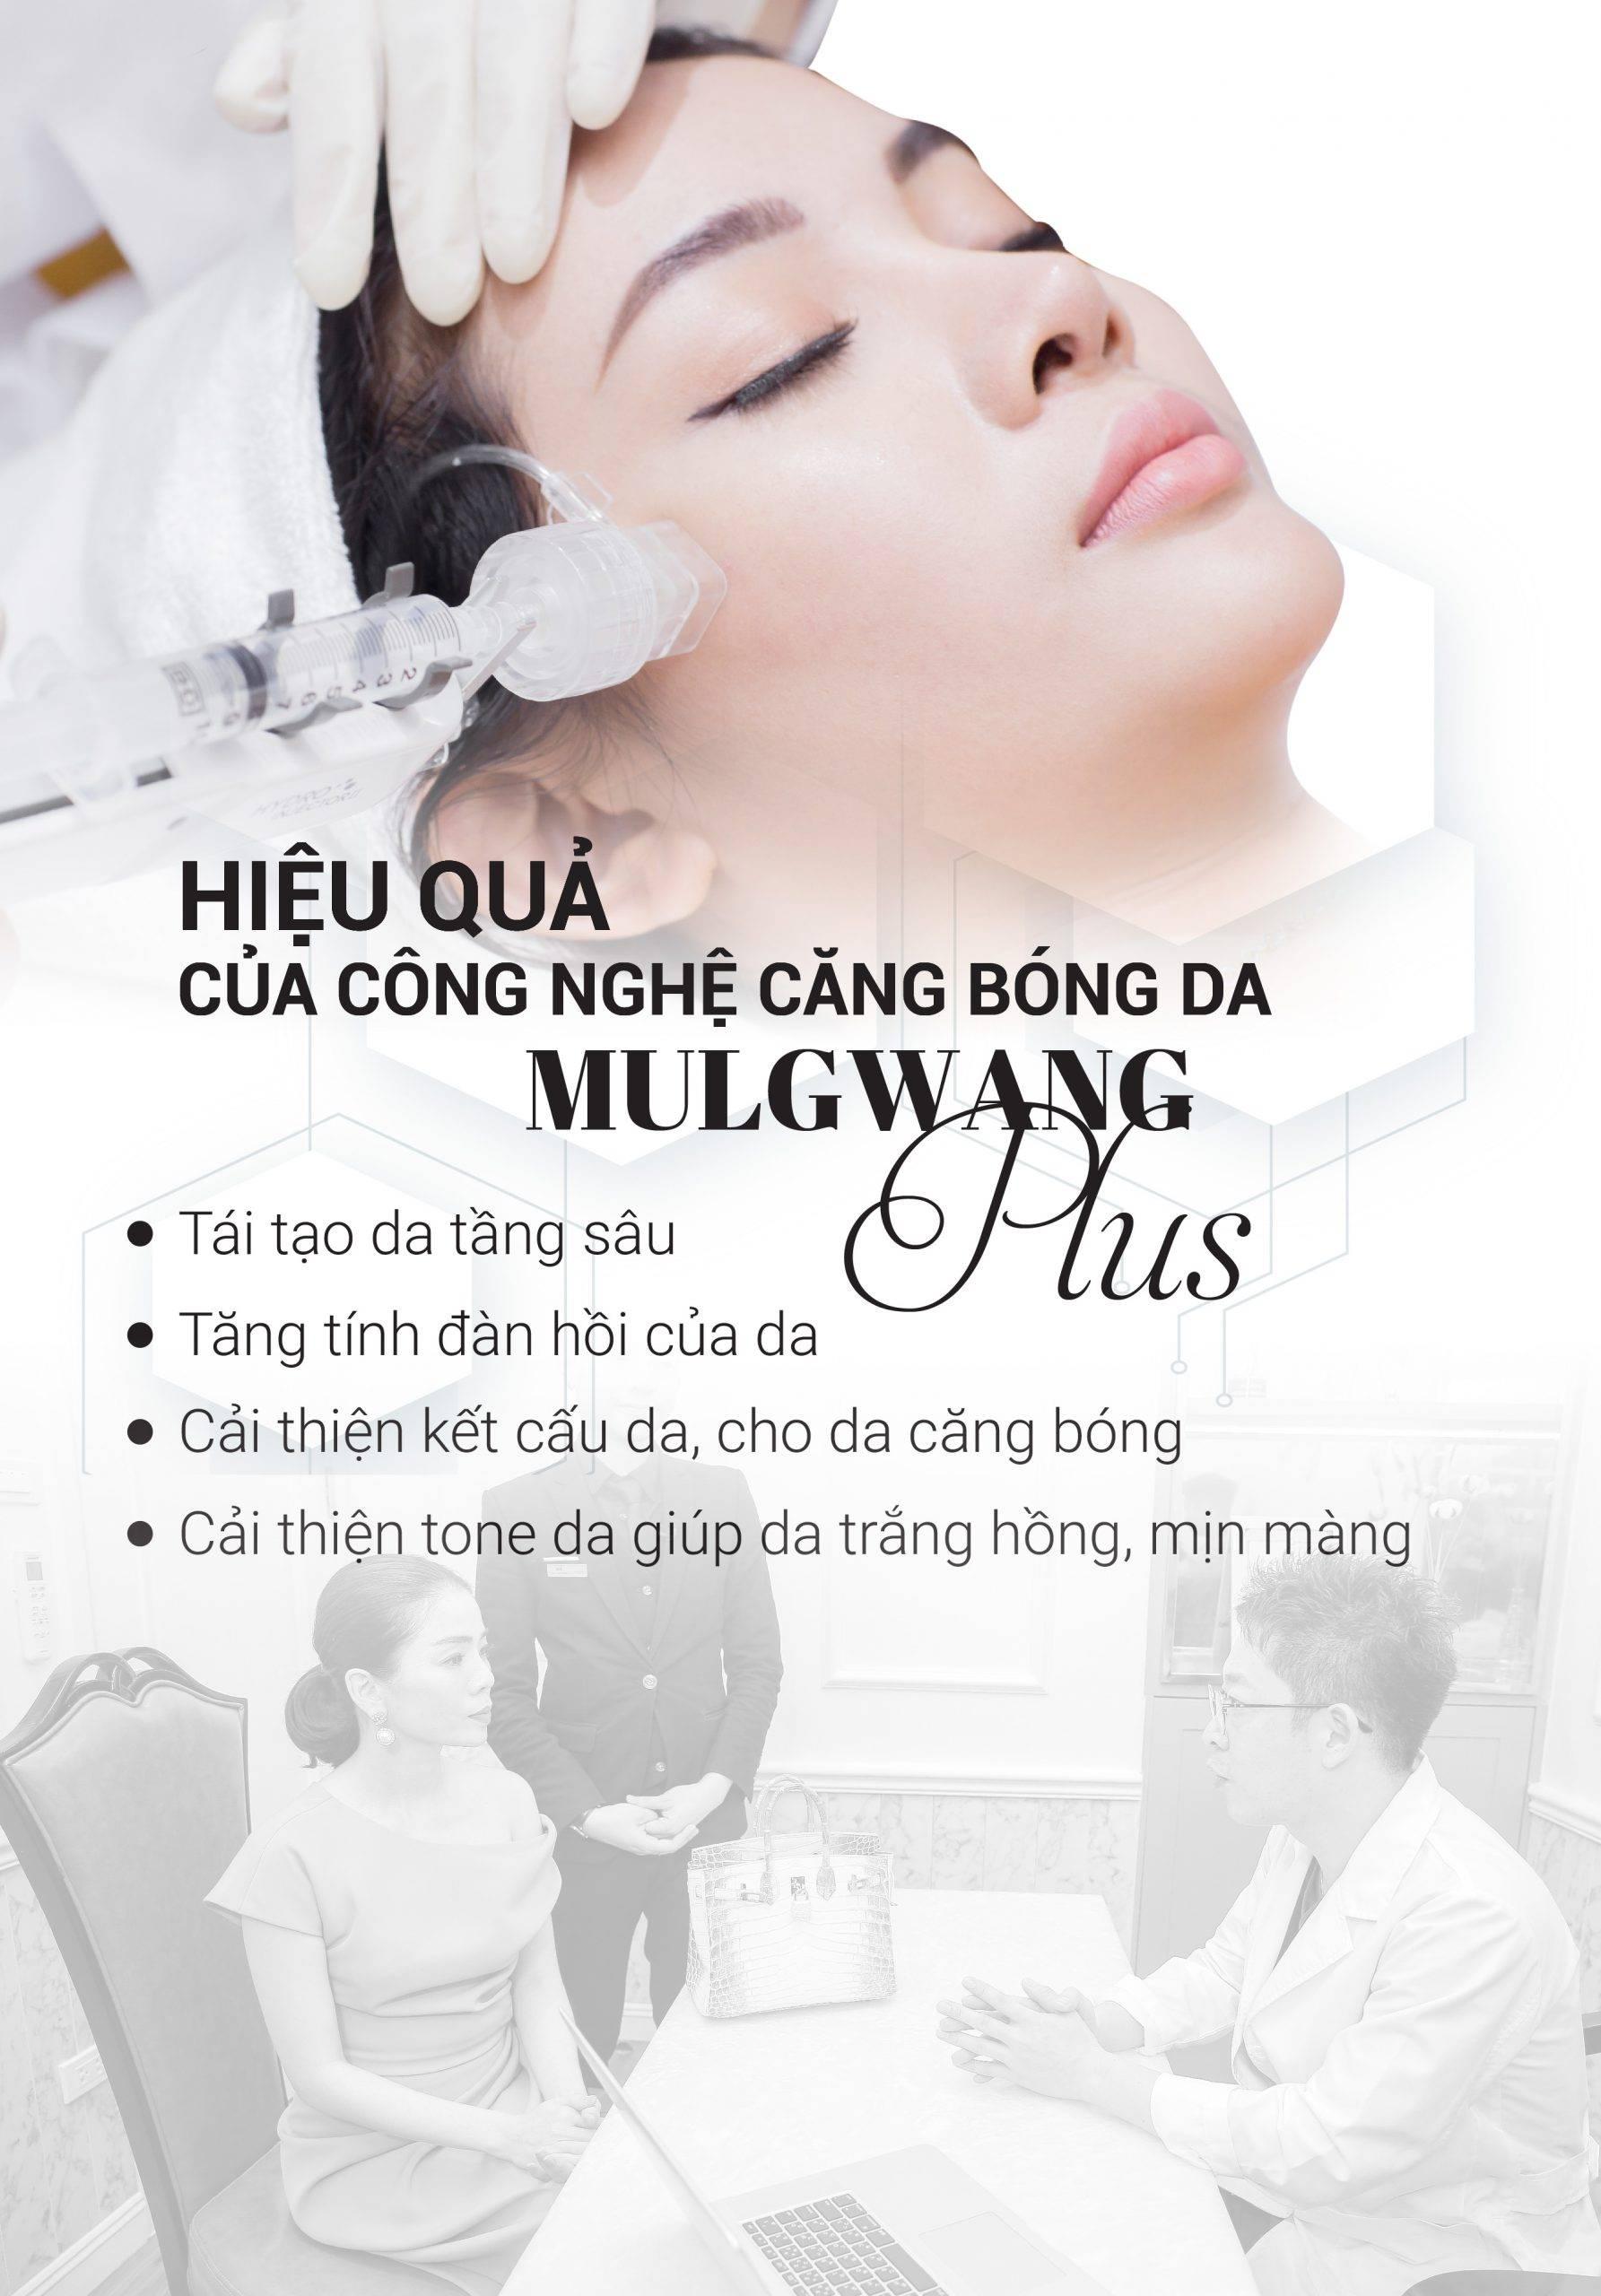 mulgwang-plus-hieu-qua-mobile